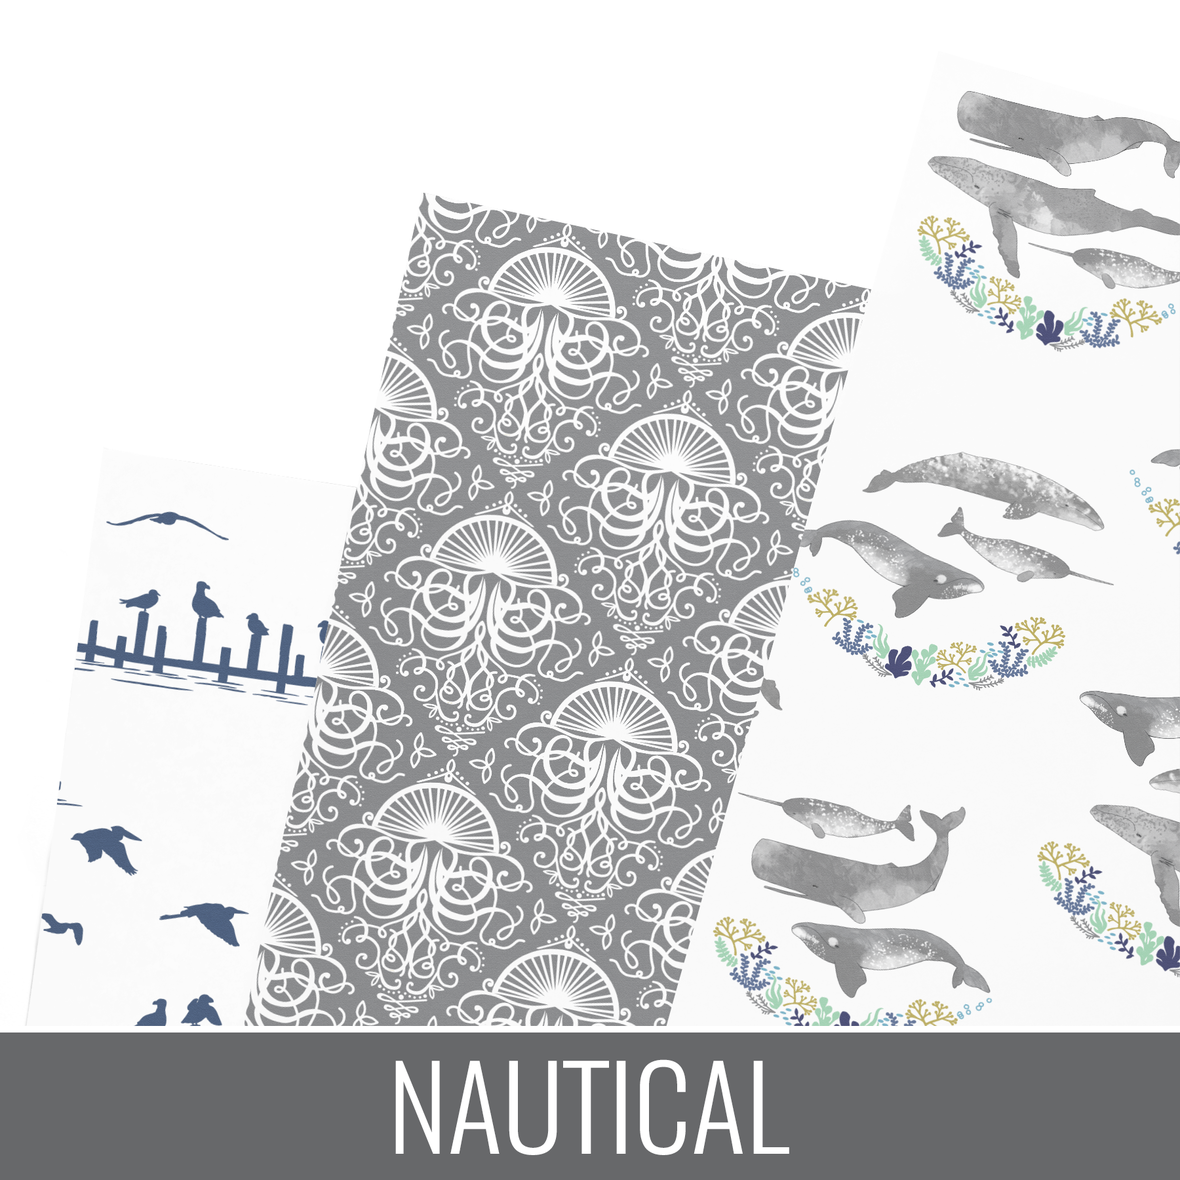 Nautical final